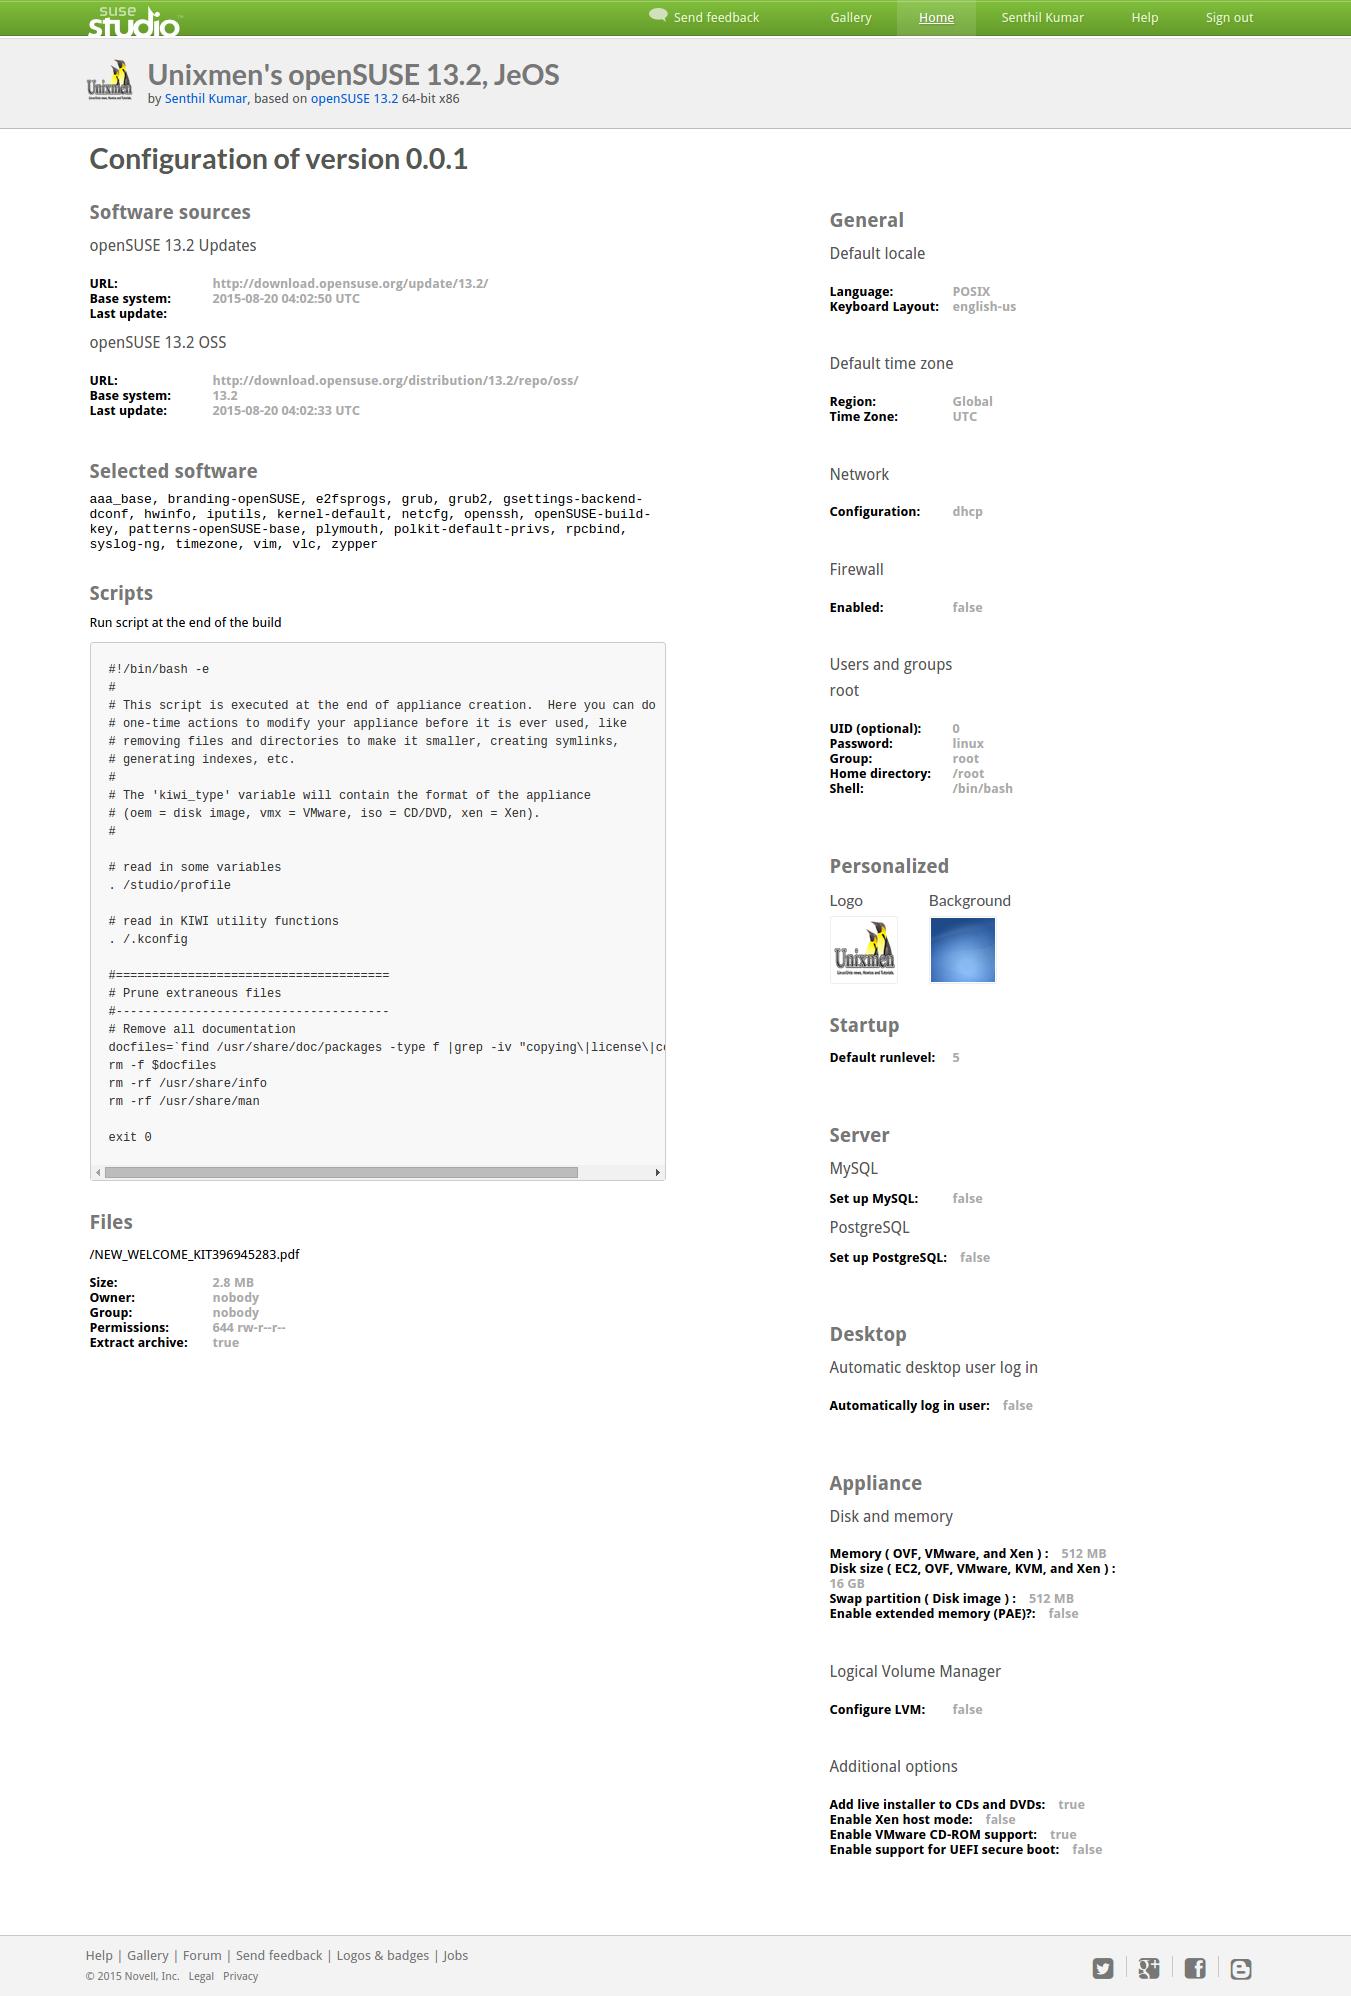 Unixmen's openSUS_ - https___susestudio.com_appliance_1450339_configuration_0.0.1